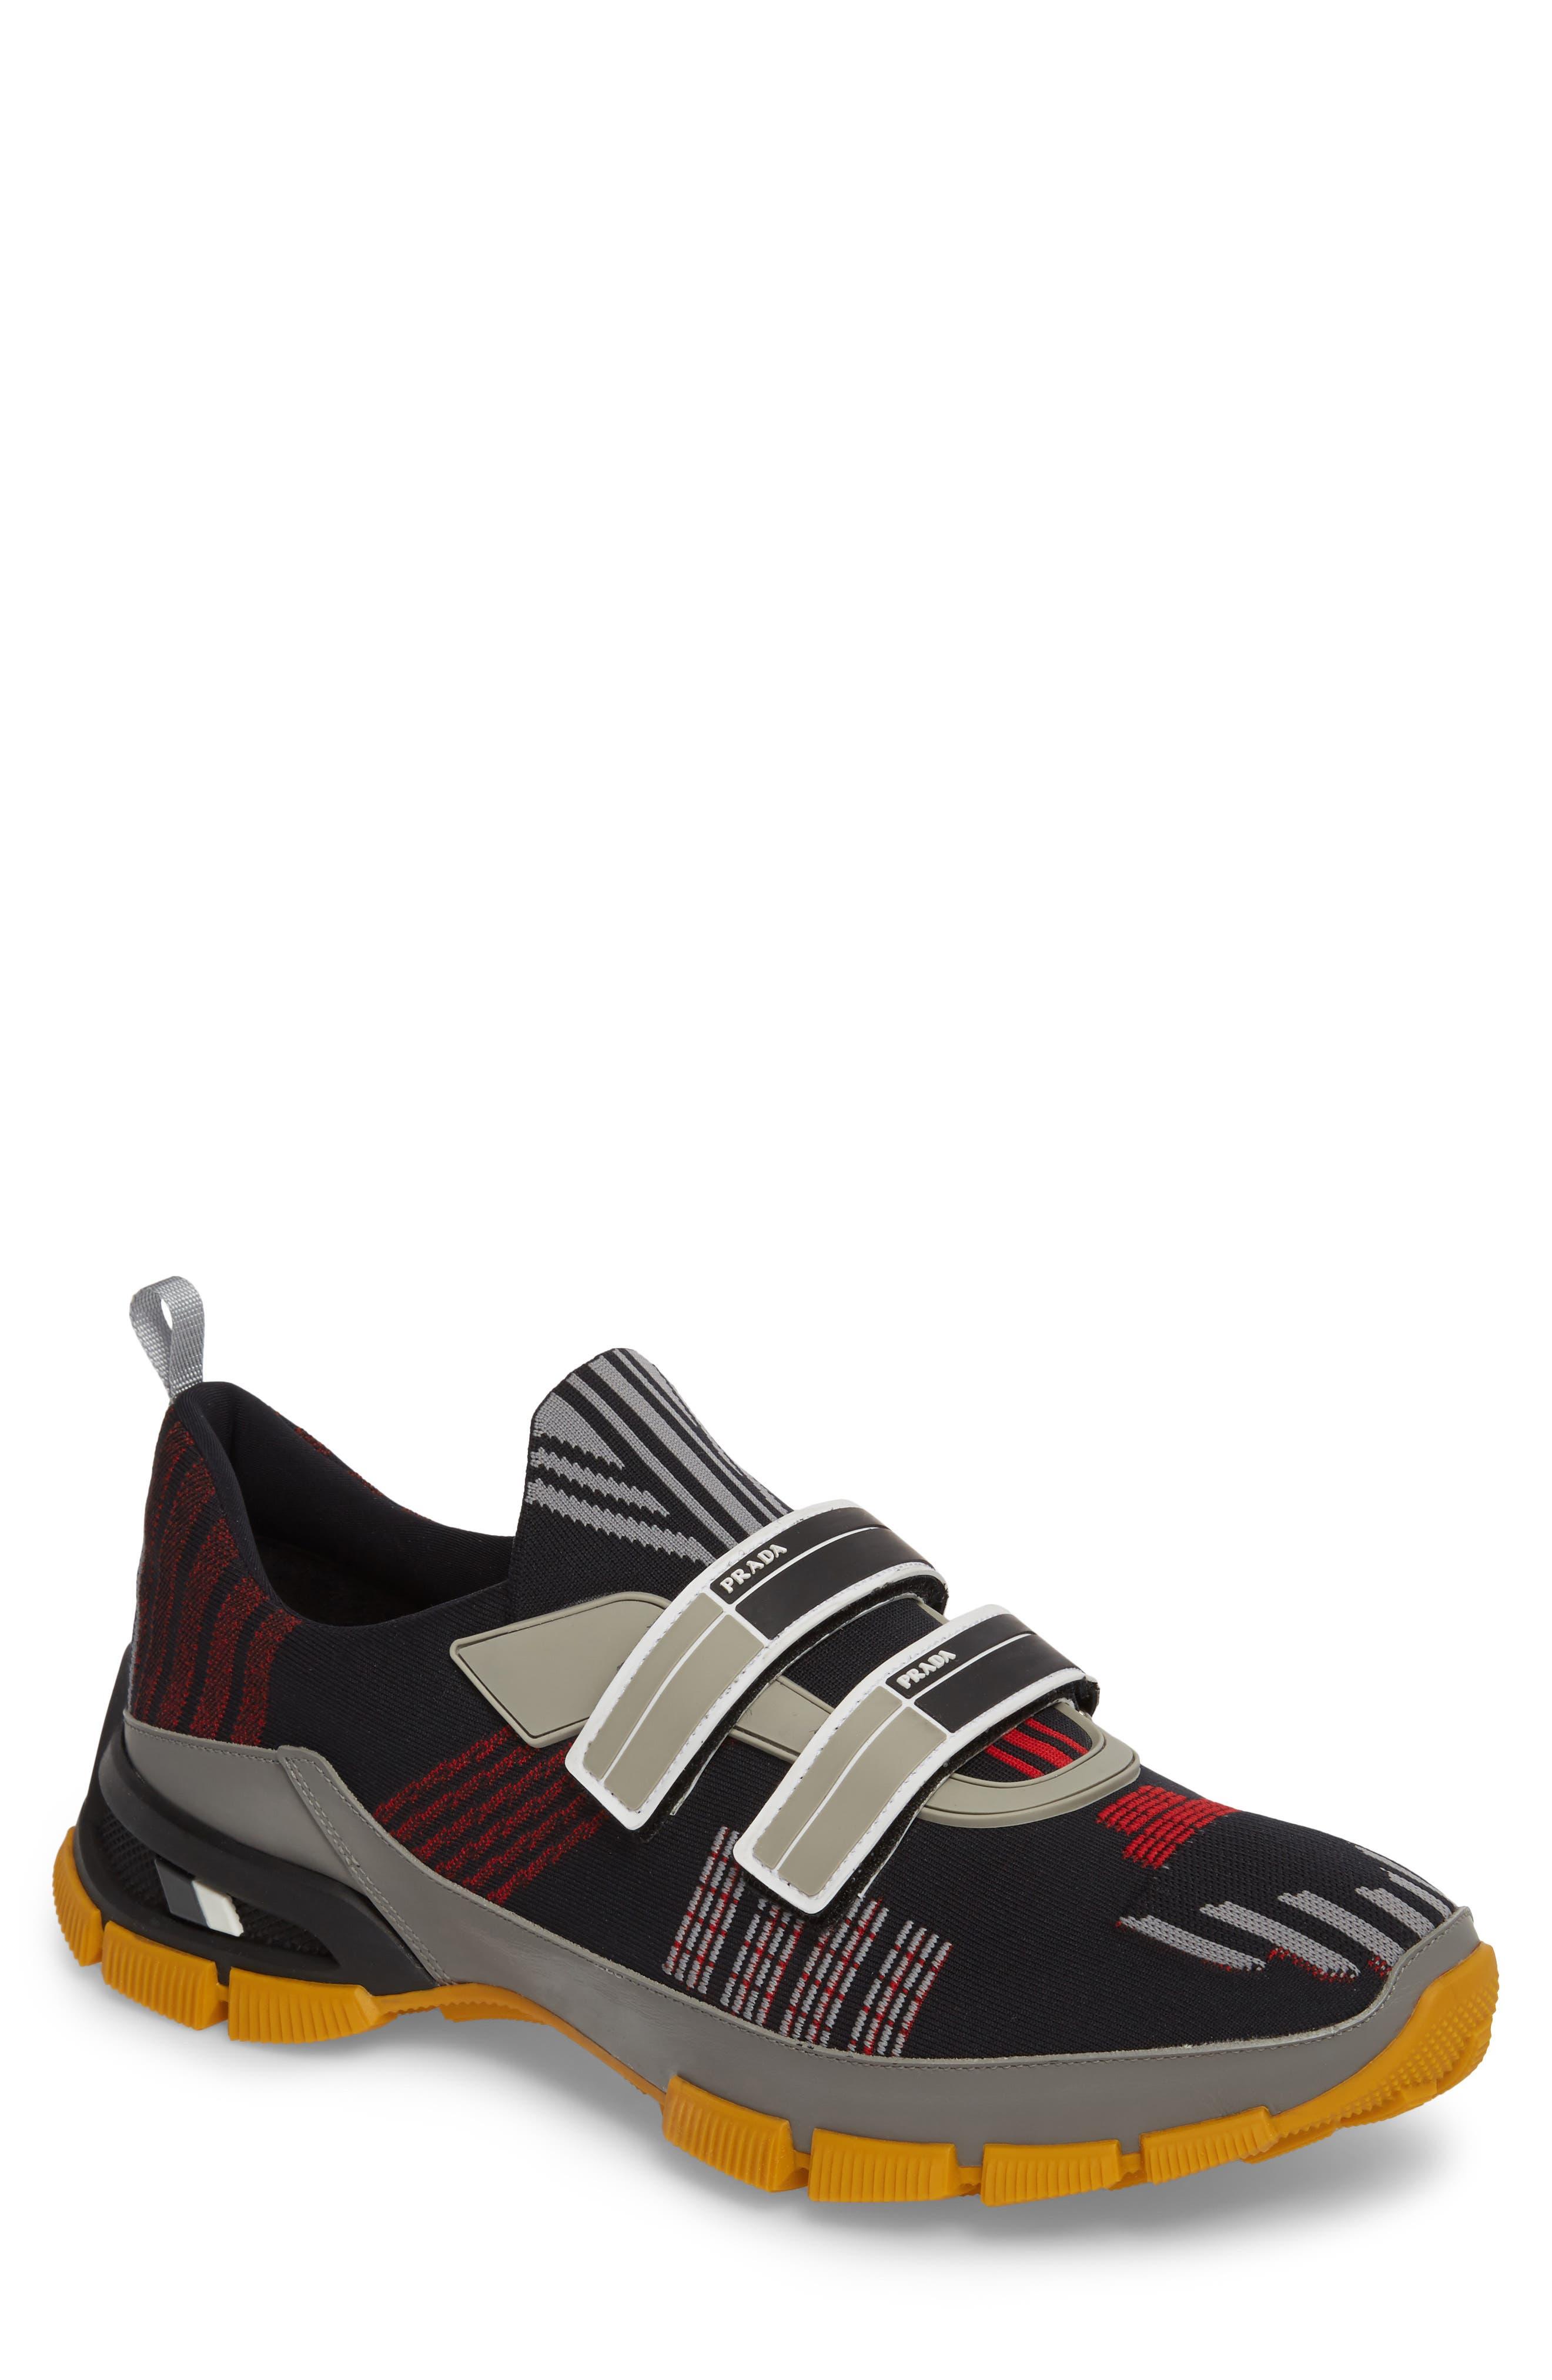 Linea Rossa Strap Sneaker,                             Main thumbnail 1, color,                             001